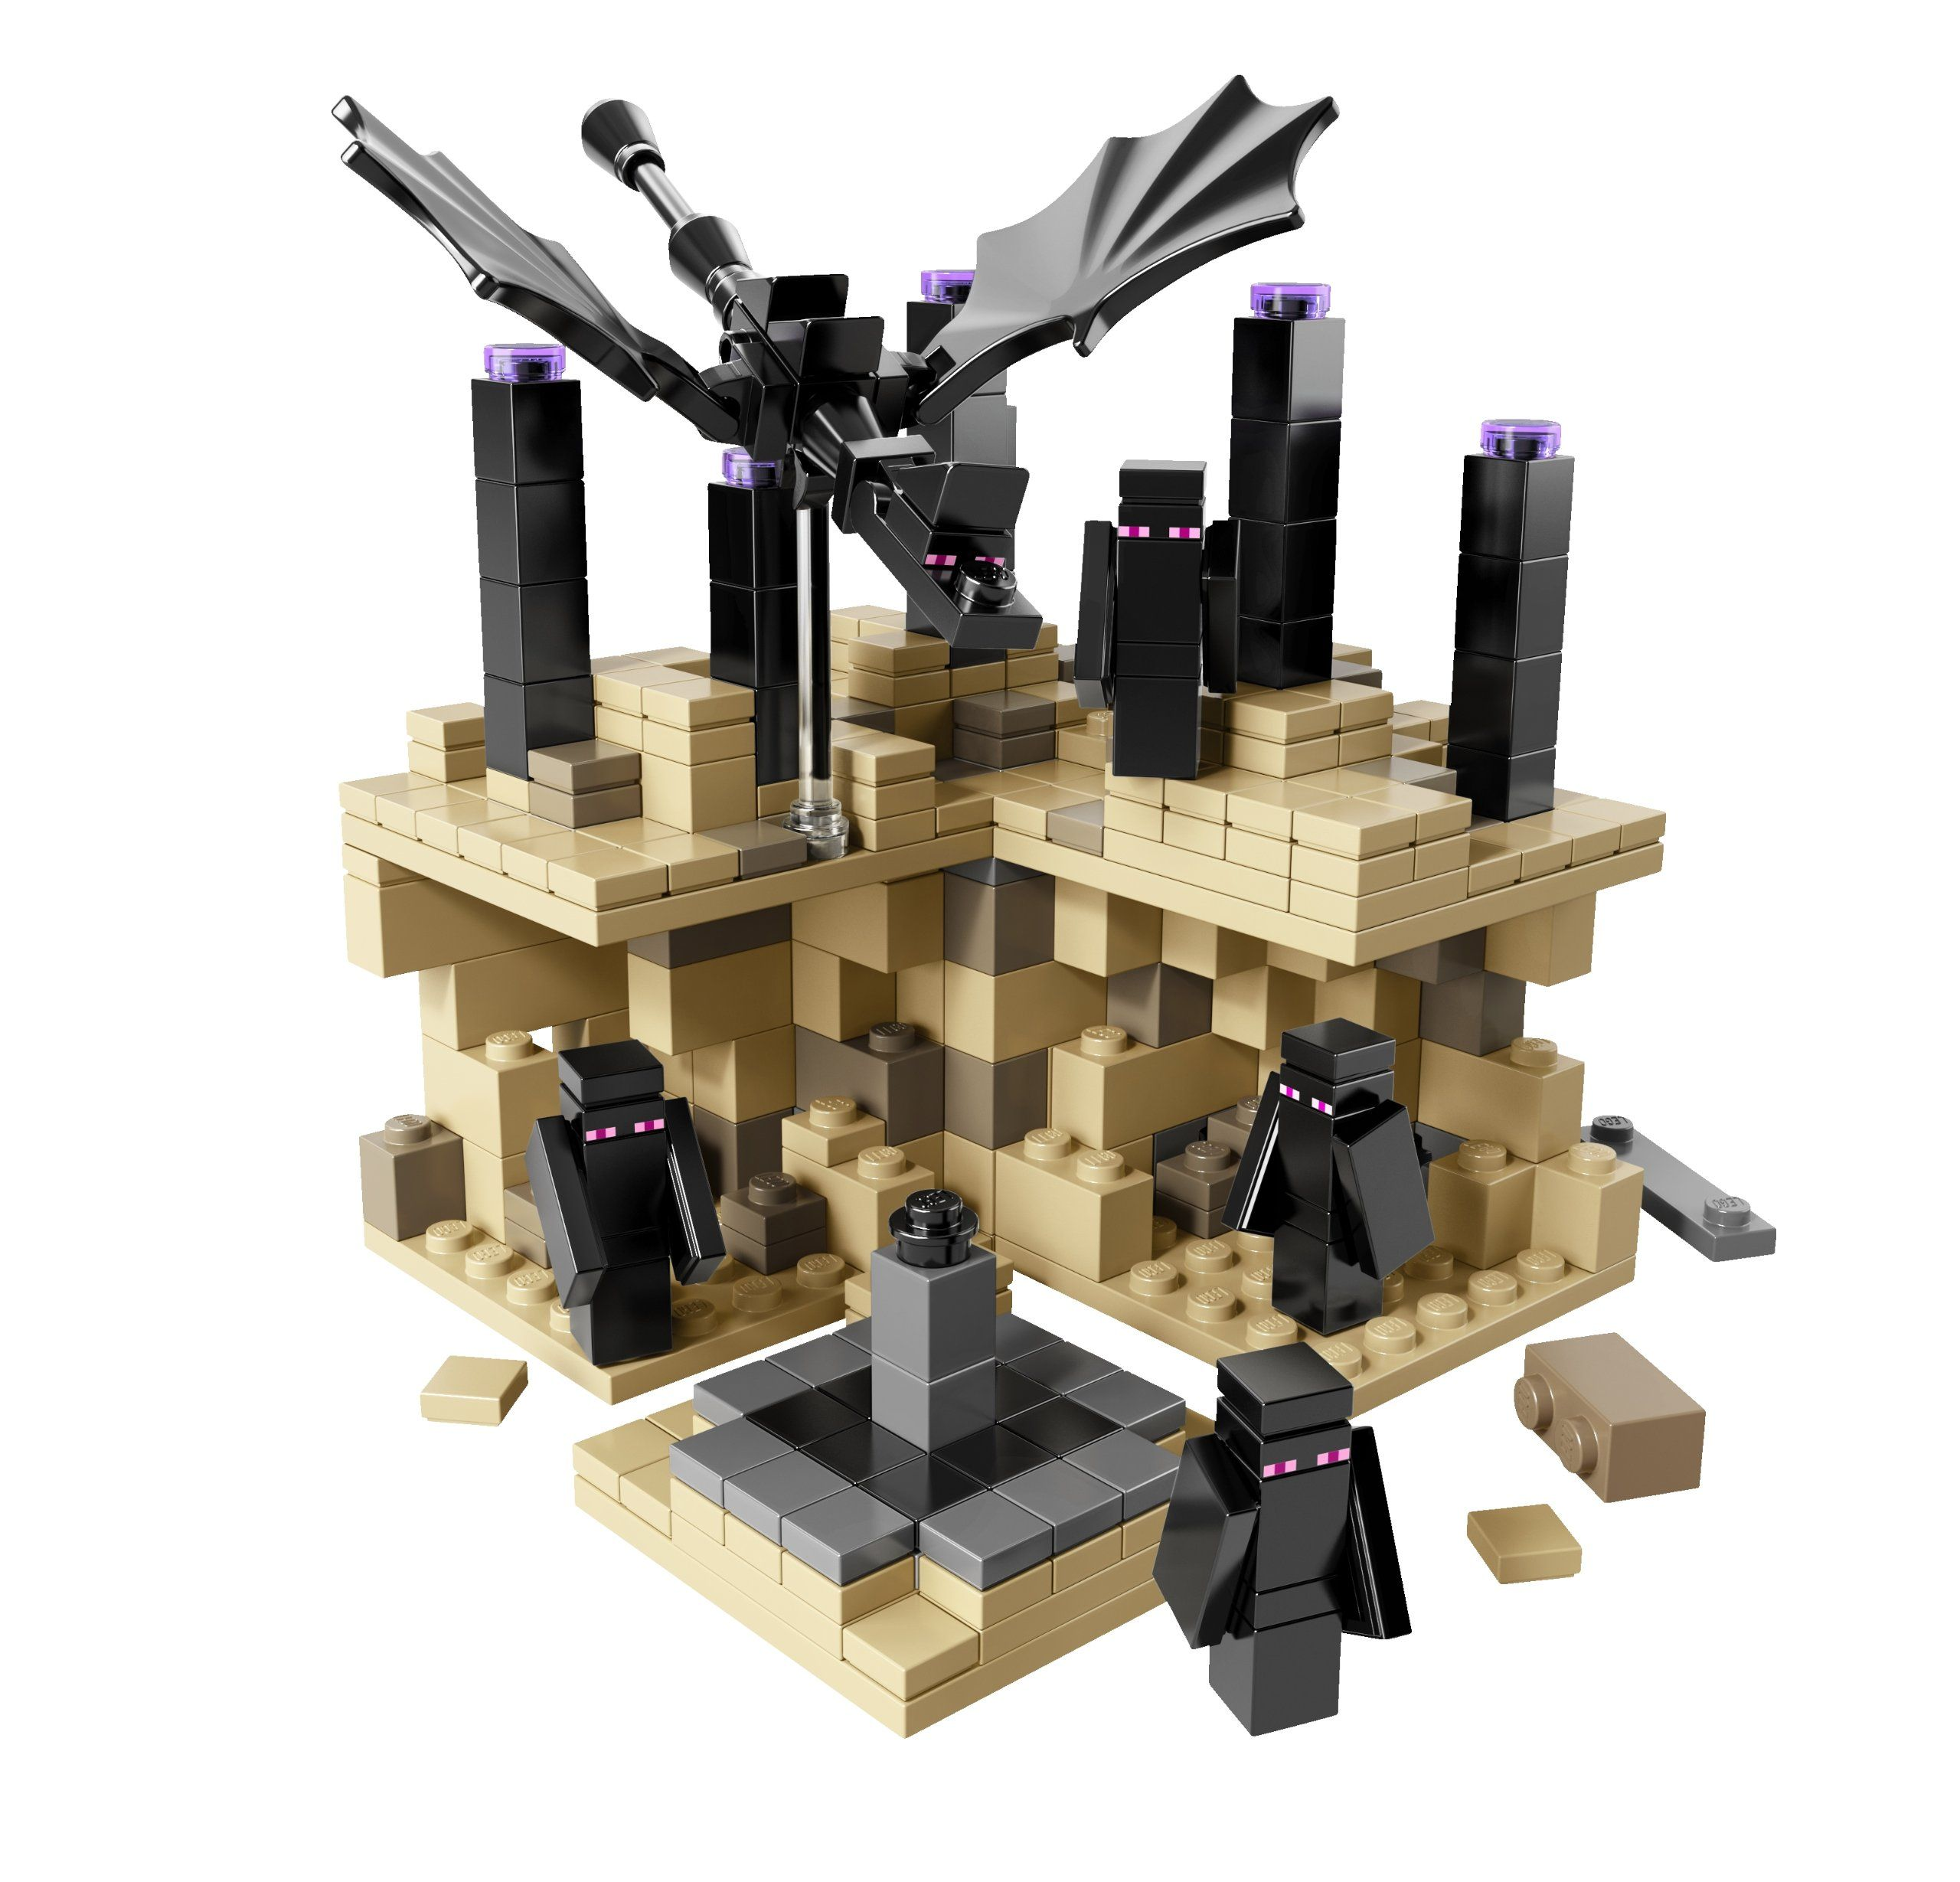 Frontrunner Amazoncom Lego Minecraft Micro World  The End 21107